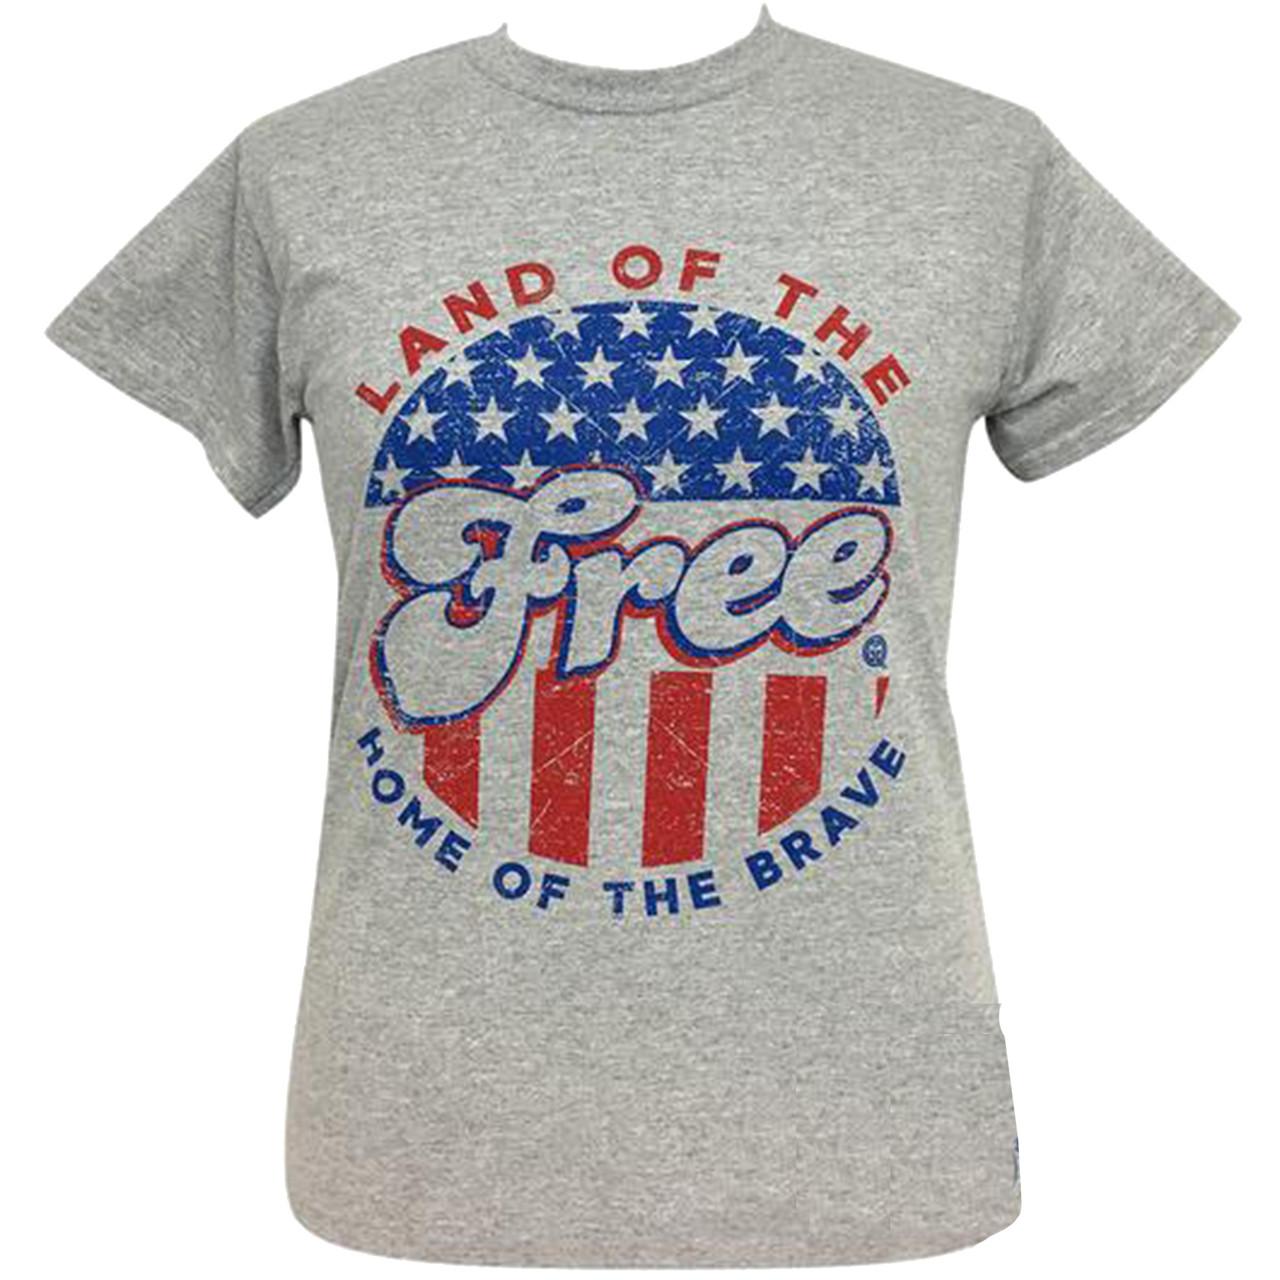 f8ddfc1c5a656 Girlie Girl Originals Land of the Free Short Sleeve T-Shirt